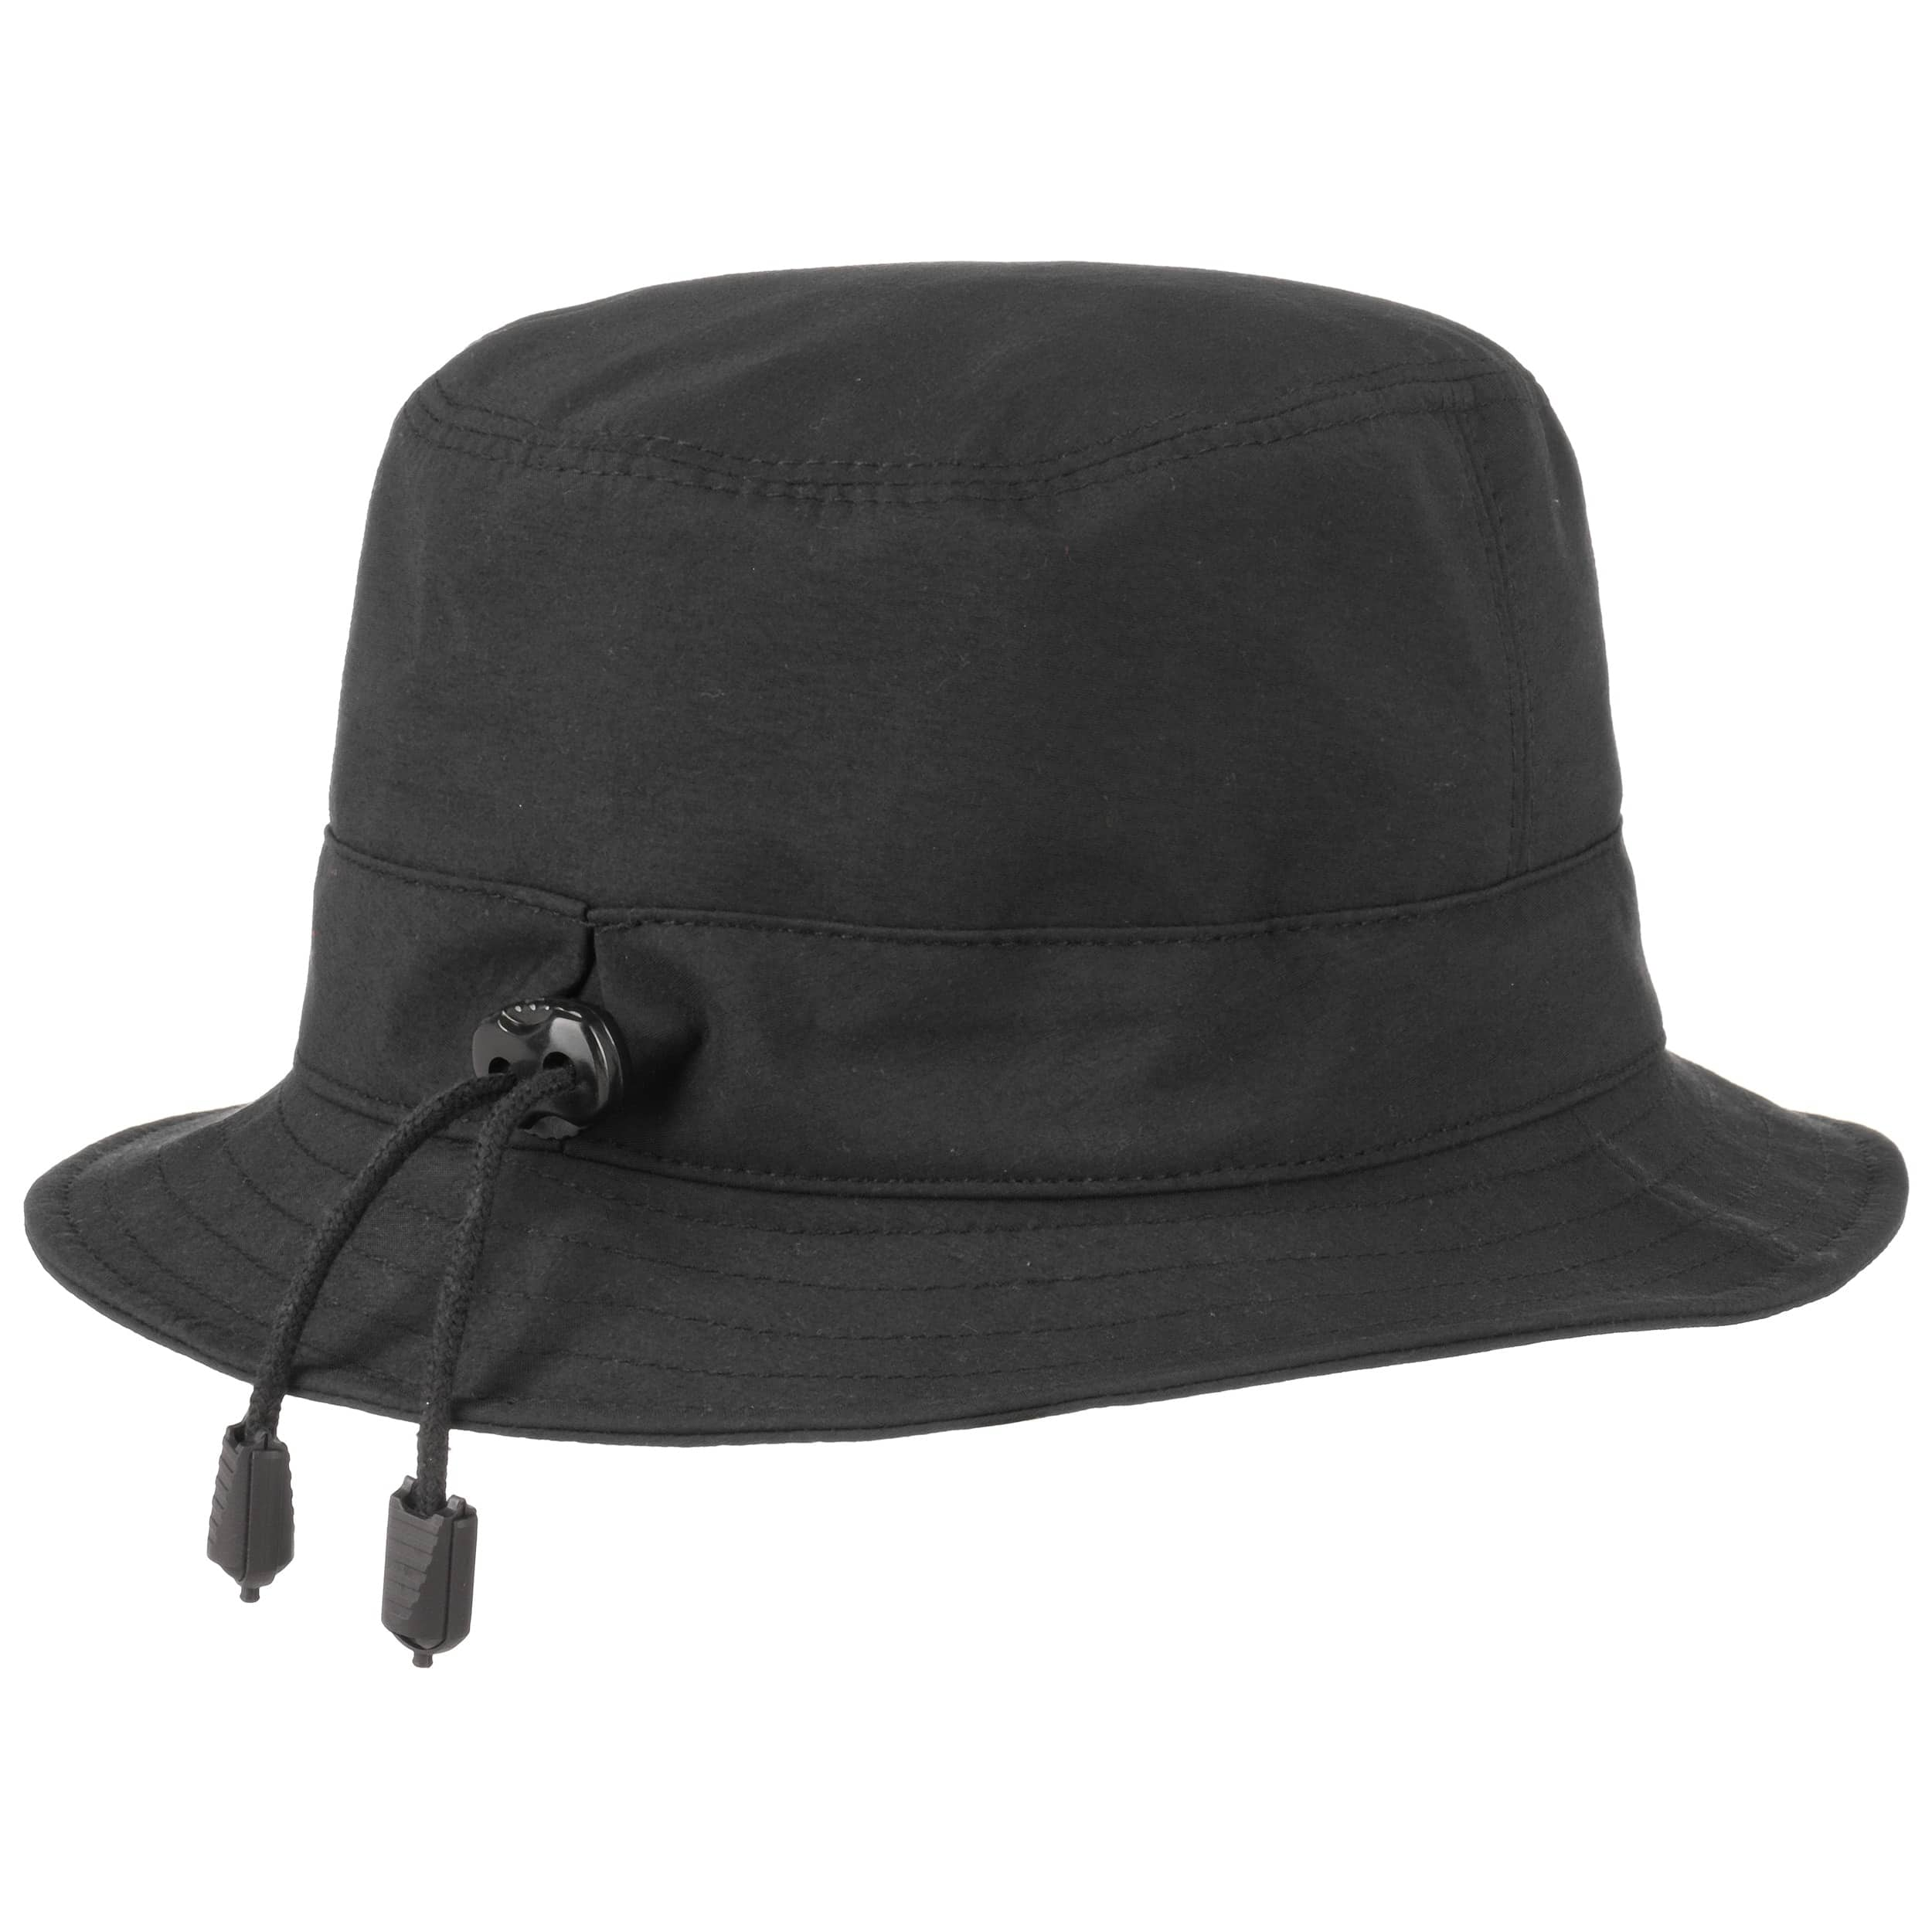 2441176dc0f ... Gore-Tex Light Rain Hat by Lierys - black 2 ...